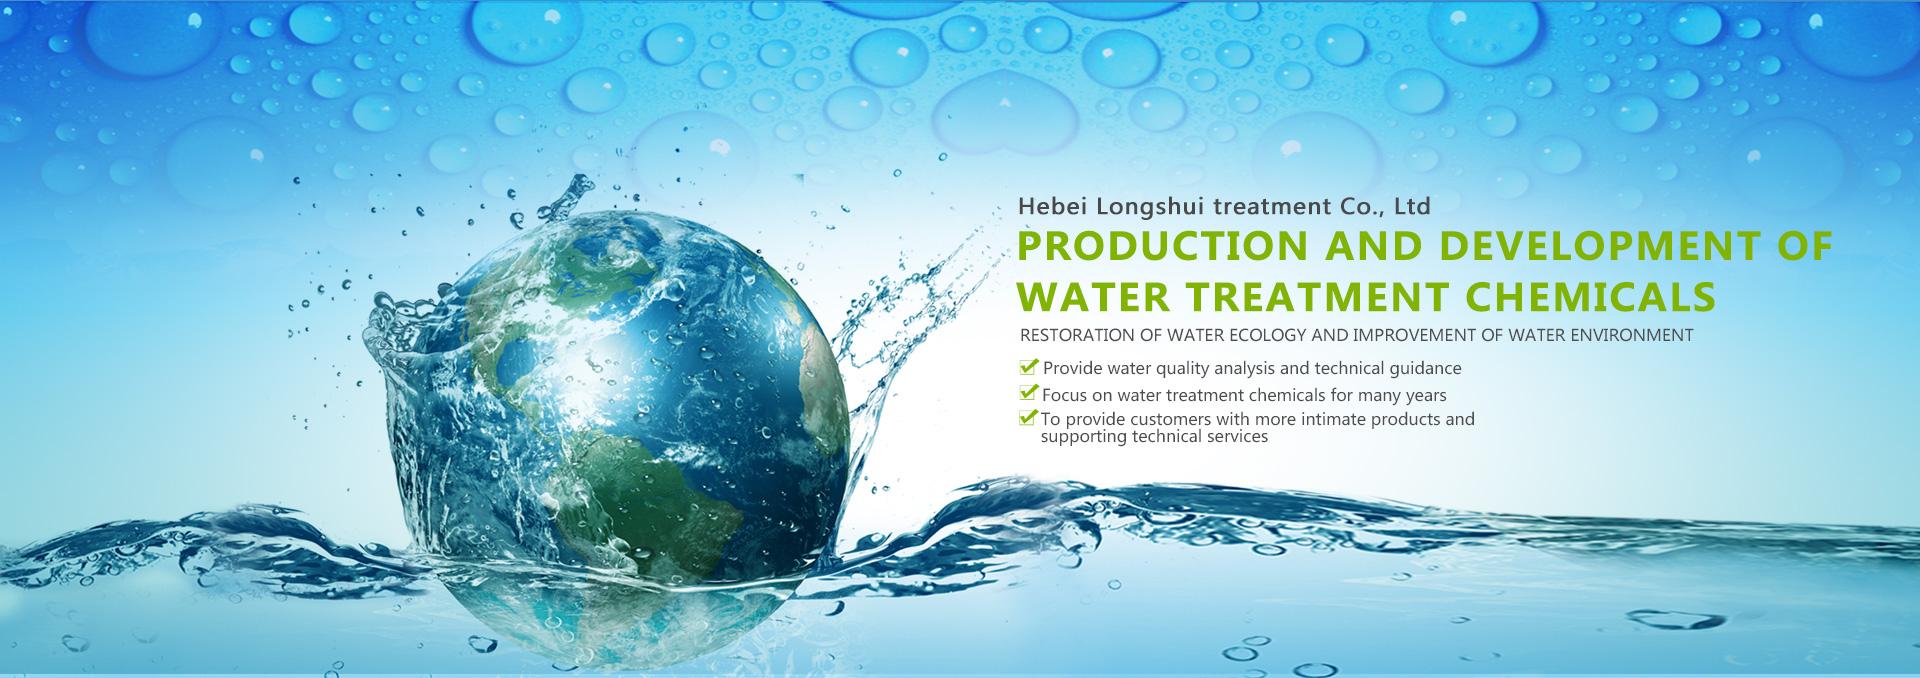 Water treatment factory, sewage treatment company, sewage treatment agent